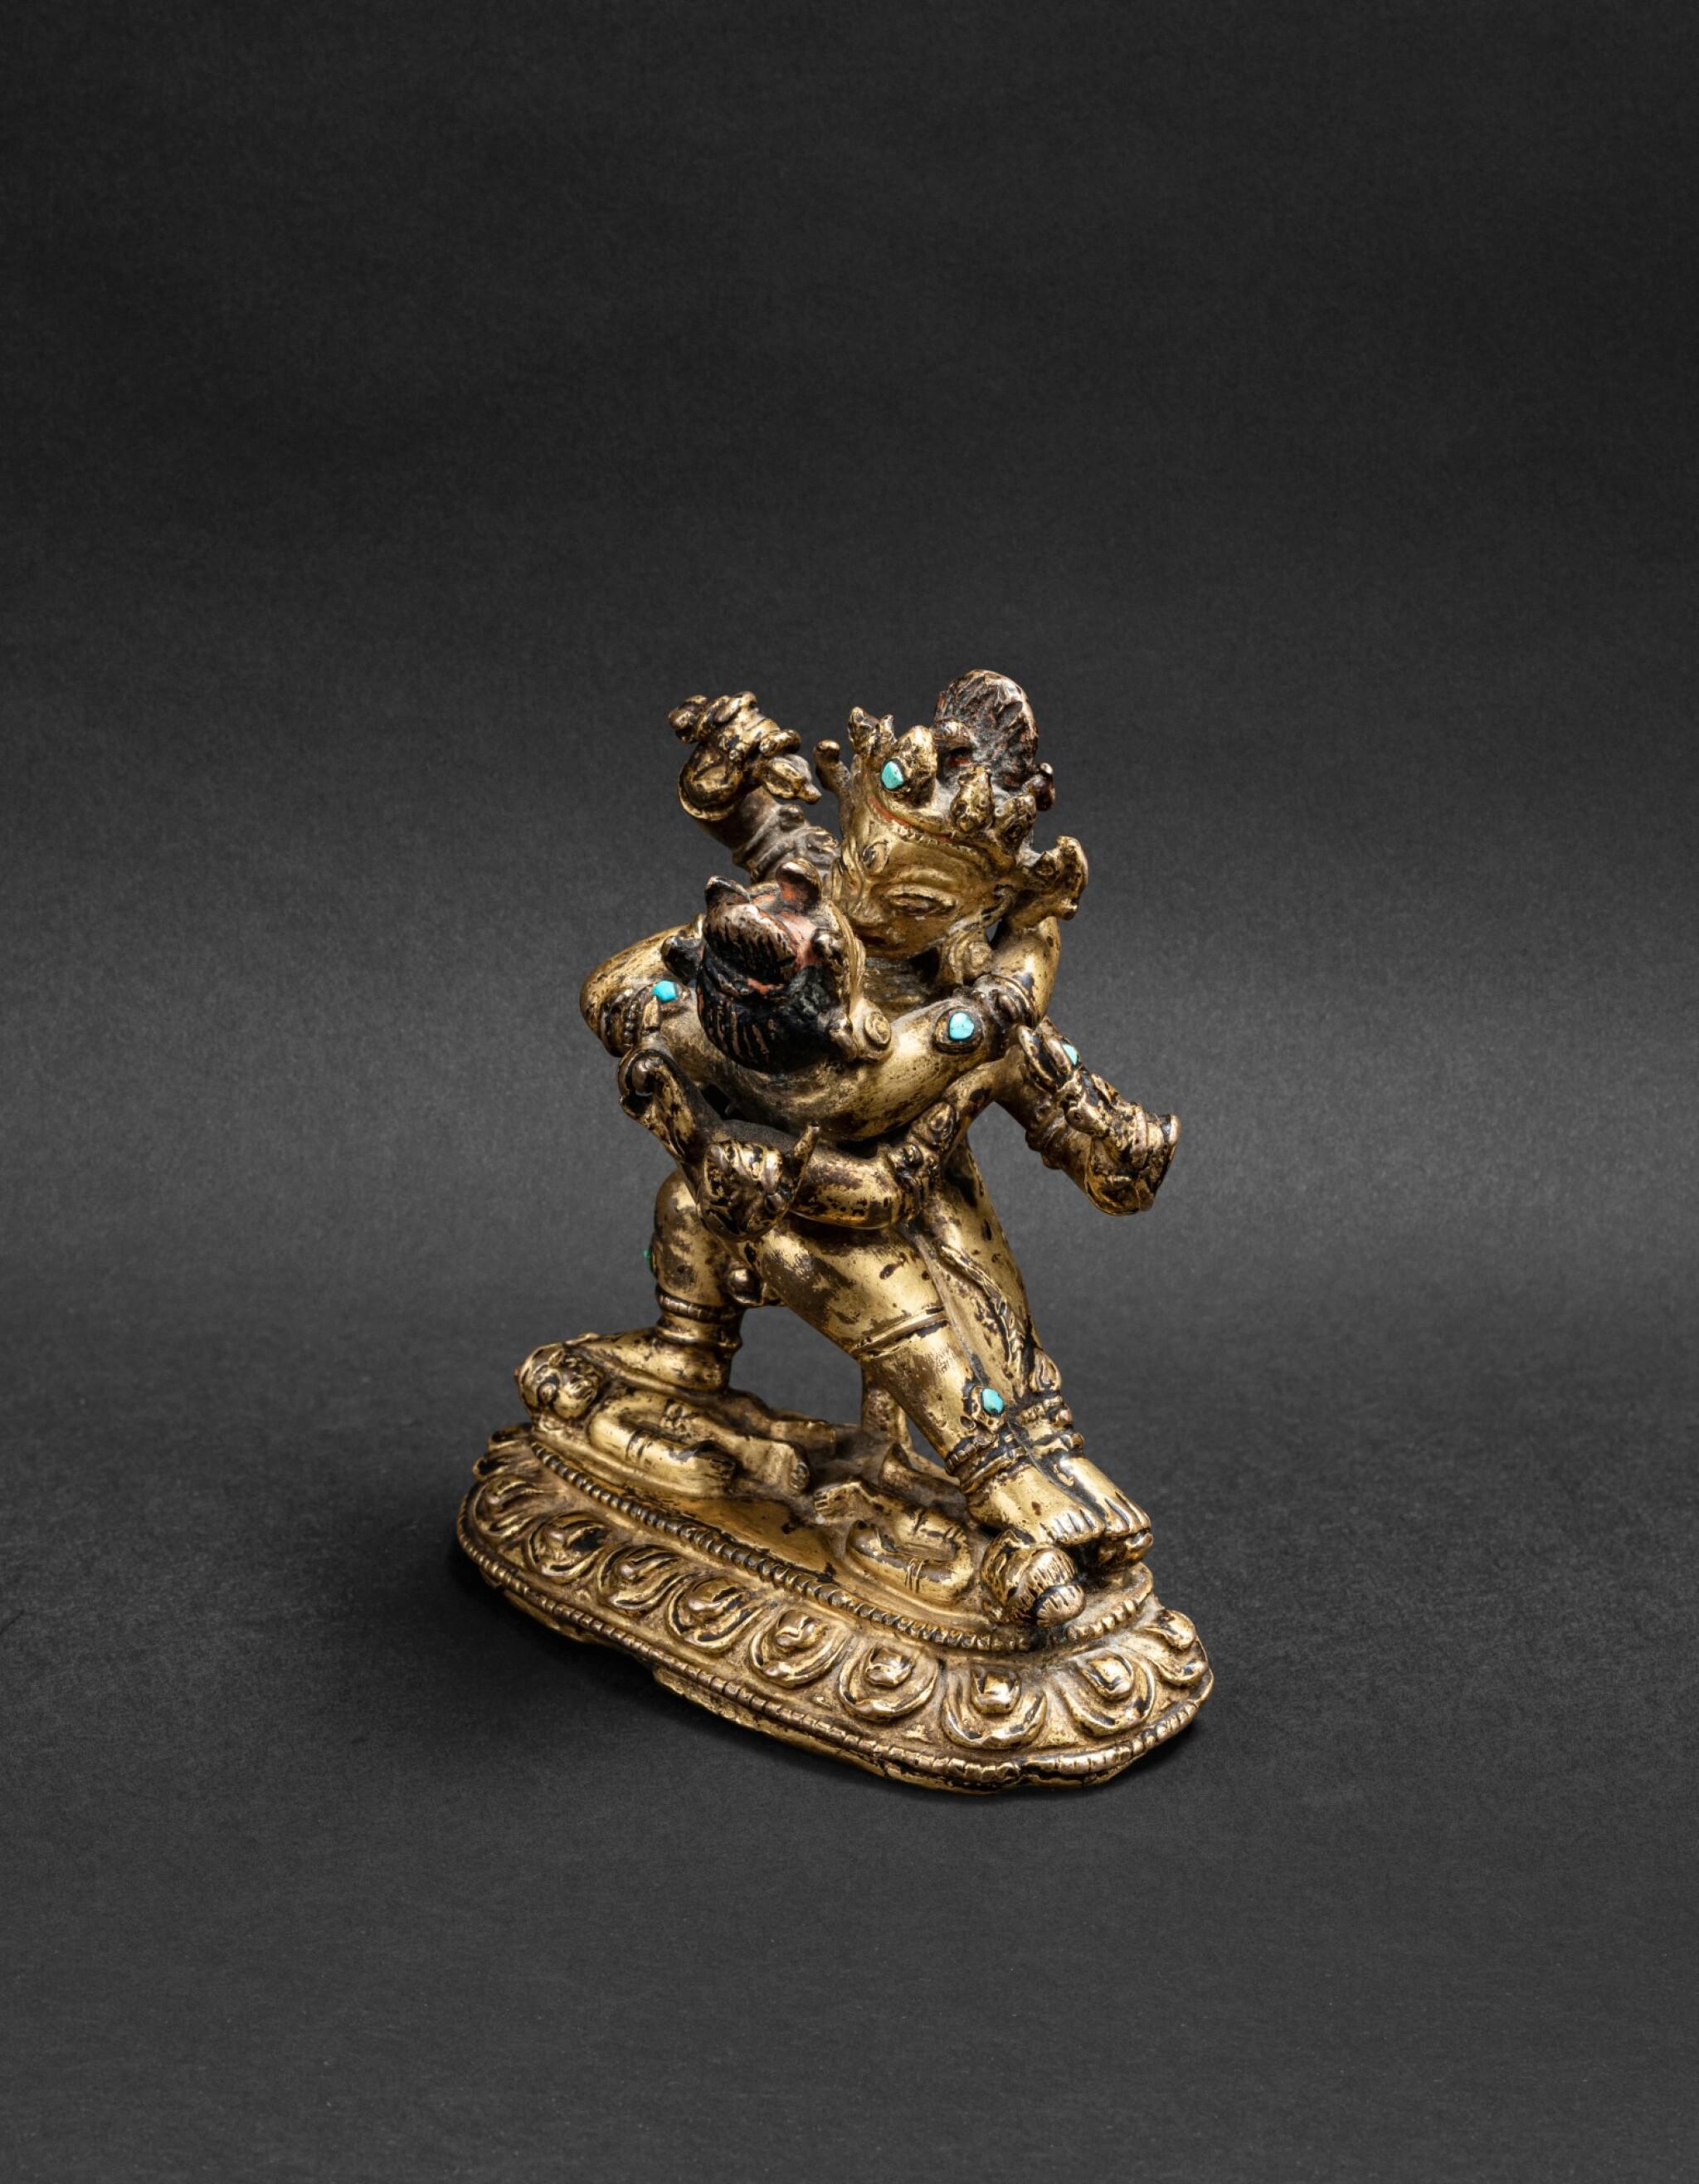 View 1 of Lot 35. Figure de Vajrahumkara en alliage de cuivre Tibet, XIVE siècle | 西藏 十四世紀 鎏金銅合金大威紅勝金剛立像 | A gilt-copper alloy figure of Vajrahumkara, Tibet, 14th century.